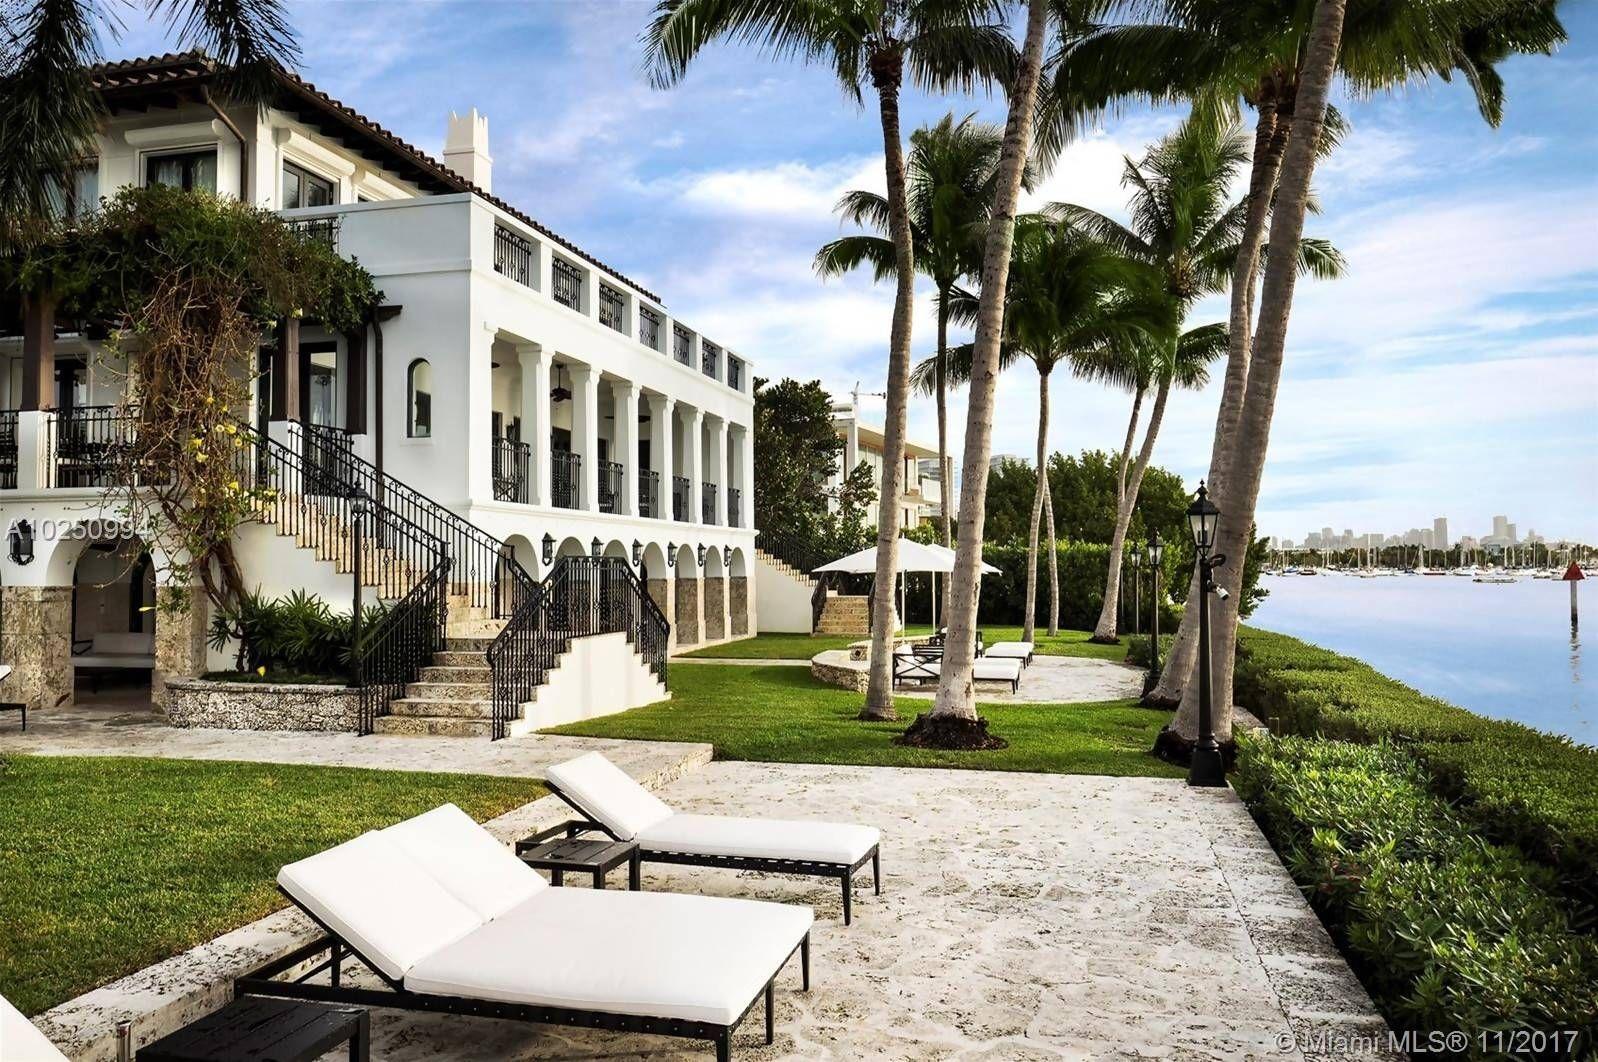 Wondrous 3080 Munroe Dr Miami Fl 33133 Home Exteriors Download Free Architecture Designs Scobabritishbridgeorg